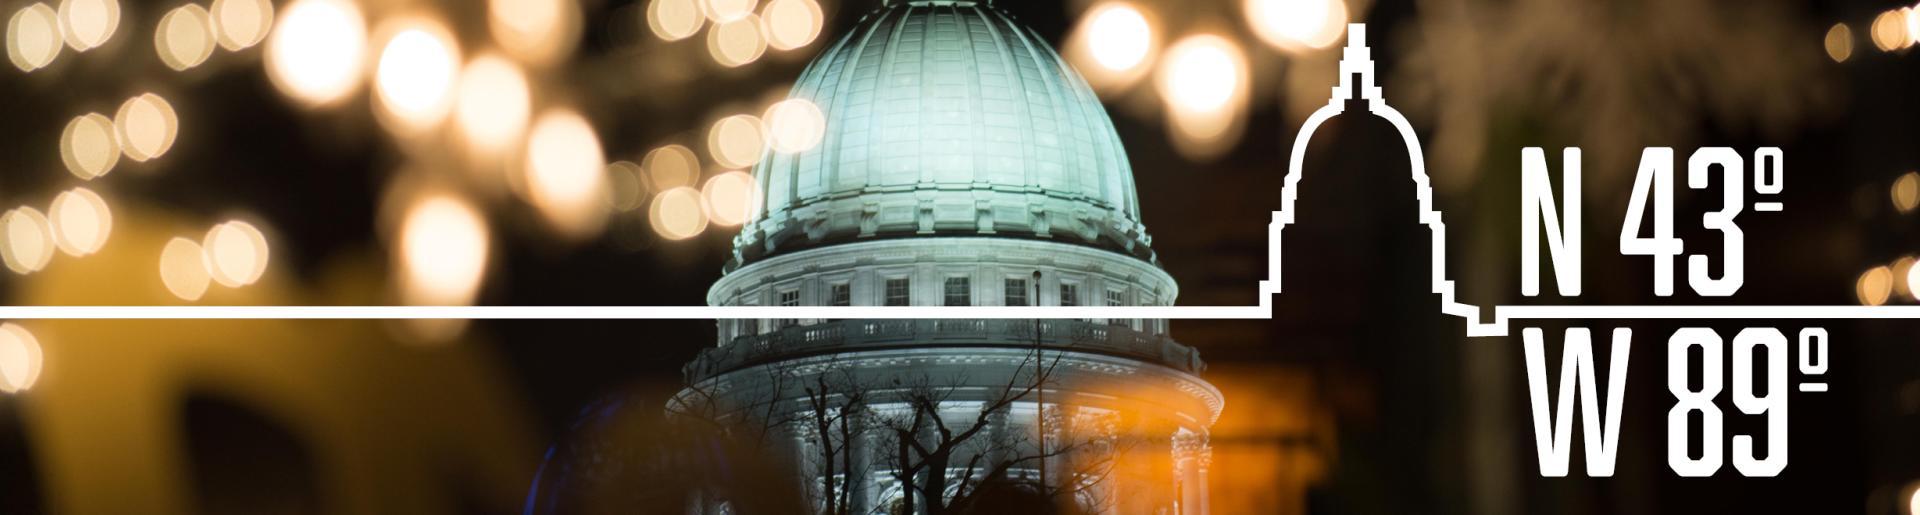 Capitol :: 43-89